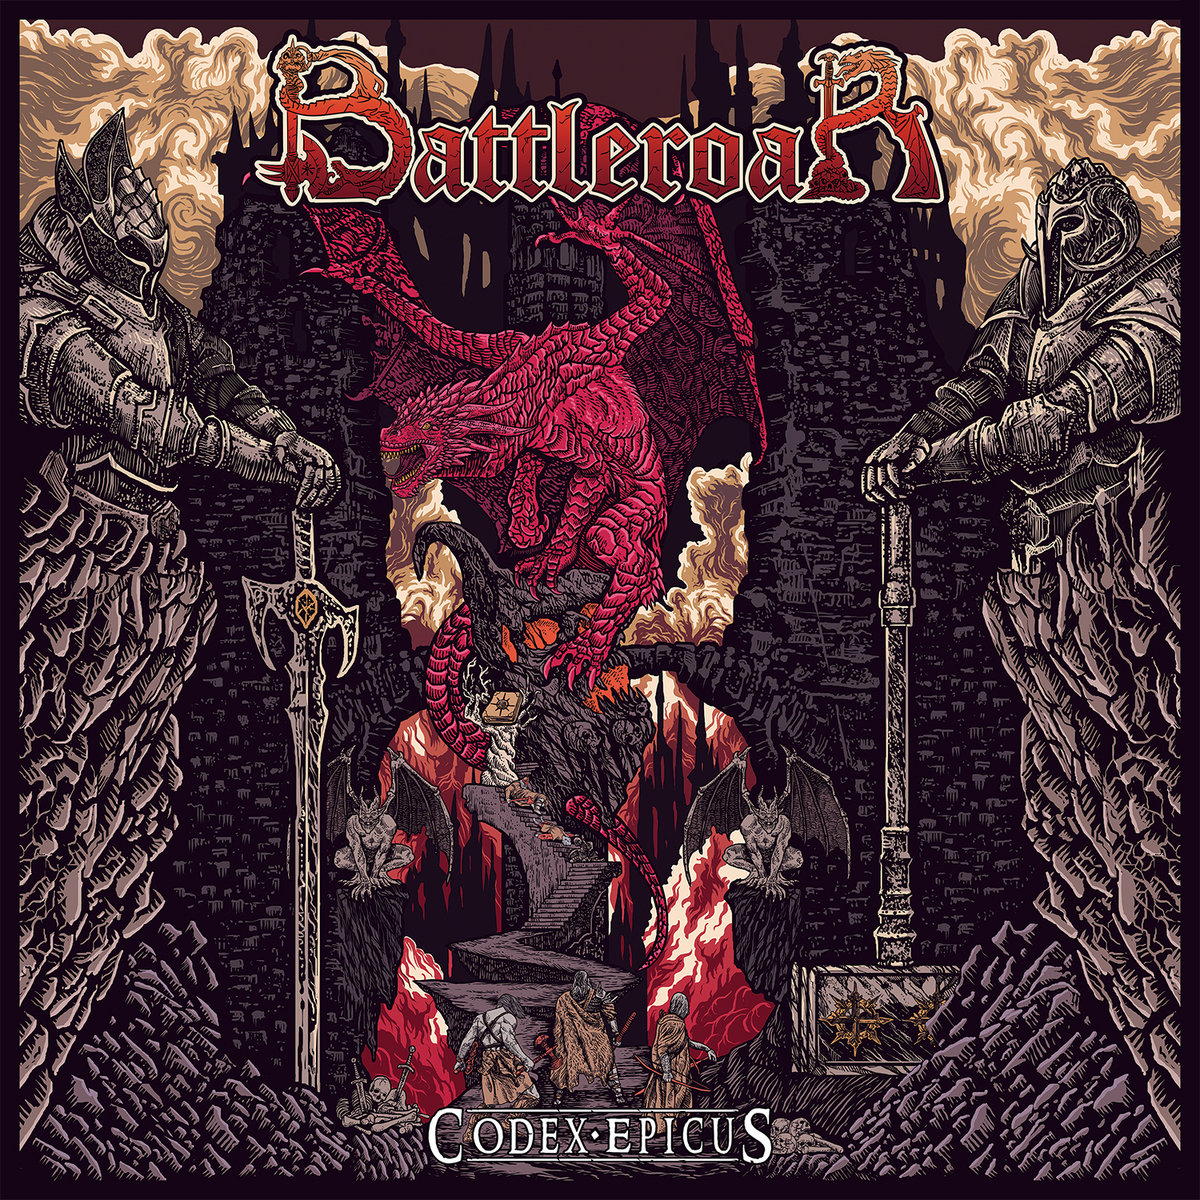 Codex Epicus | BATTLEROAR